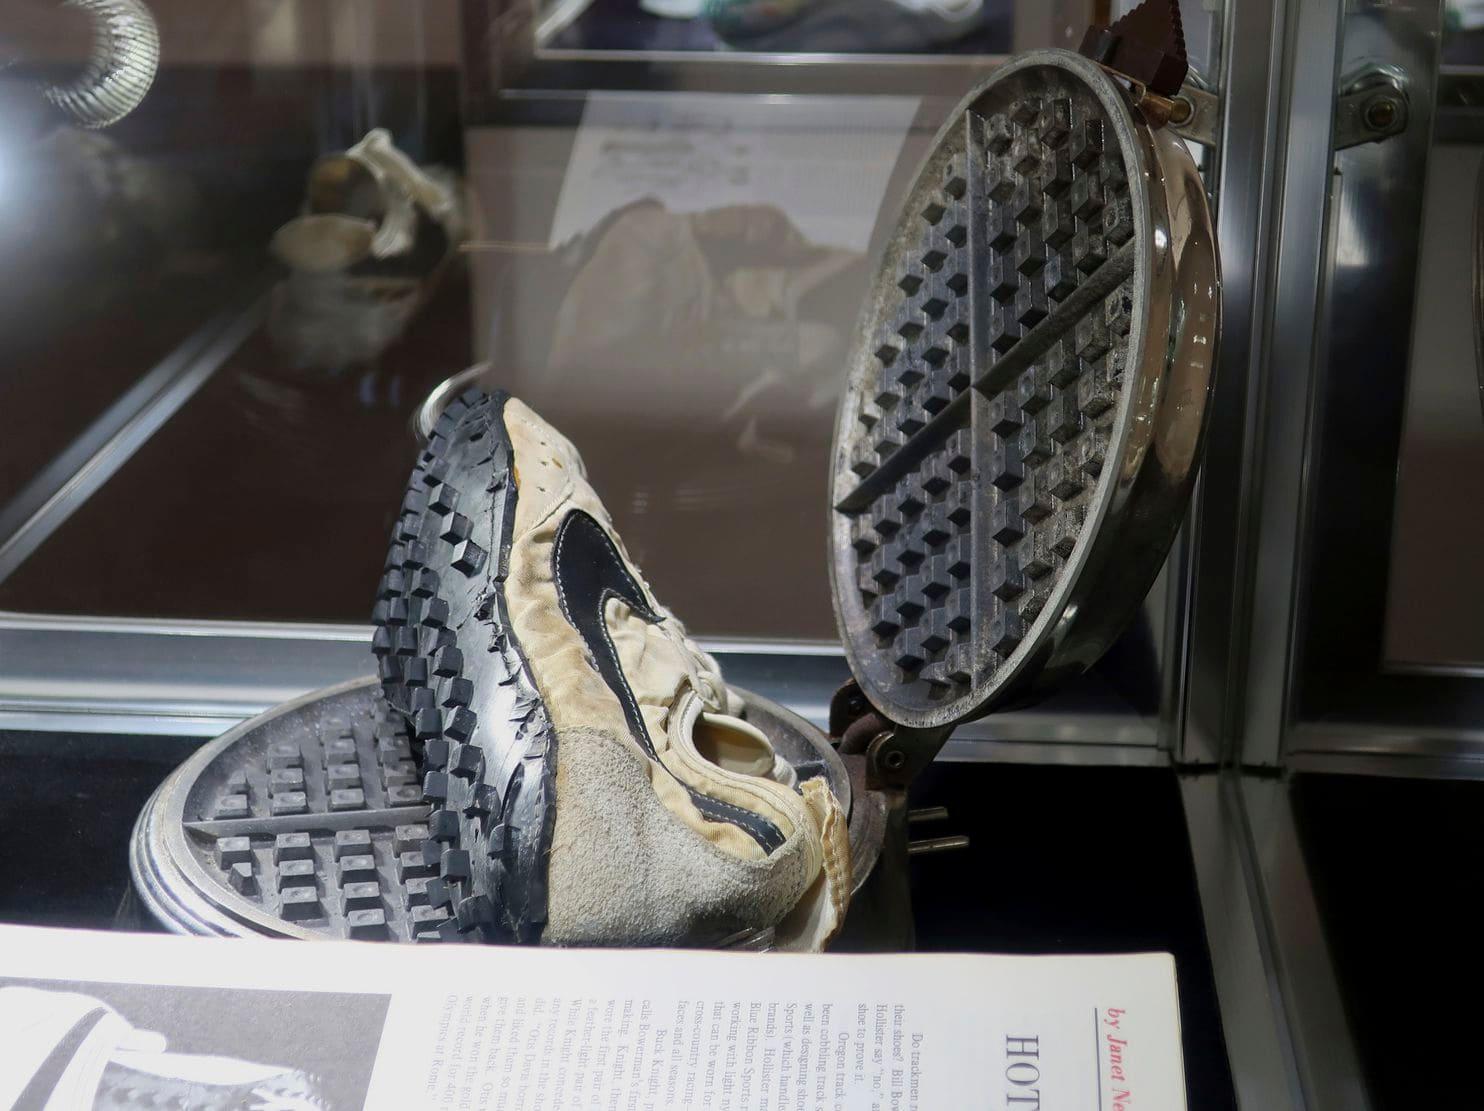 Meet rare 1972 Nike Waffle Racing Flat 'Moon Shoe'.